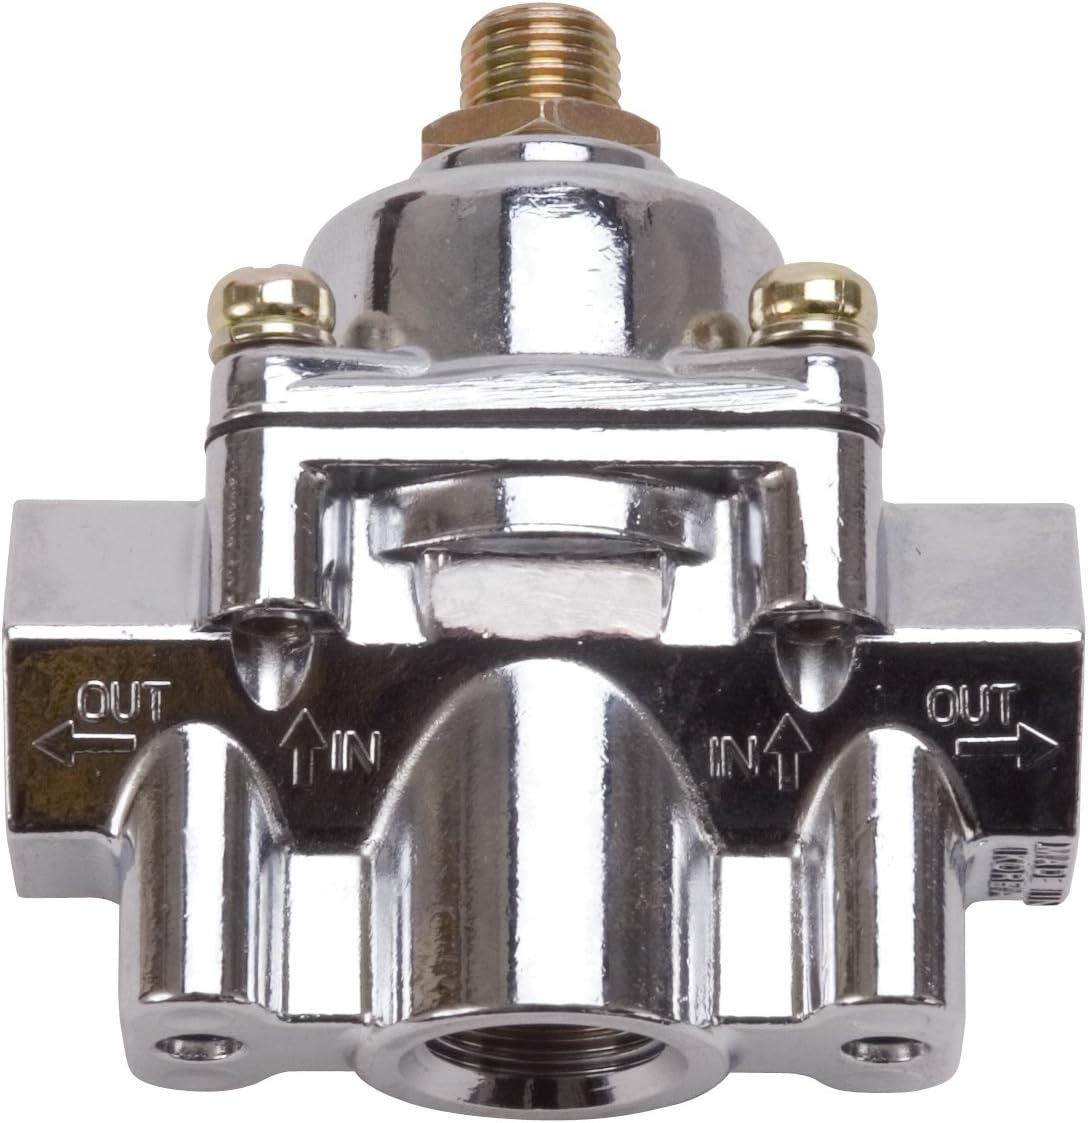 Edelbrock half 1789 1-4 PSI Chrome Pressure Max 54% OFF Fuel Regulator